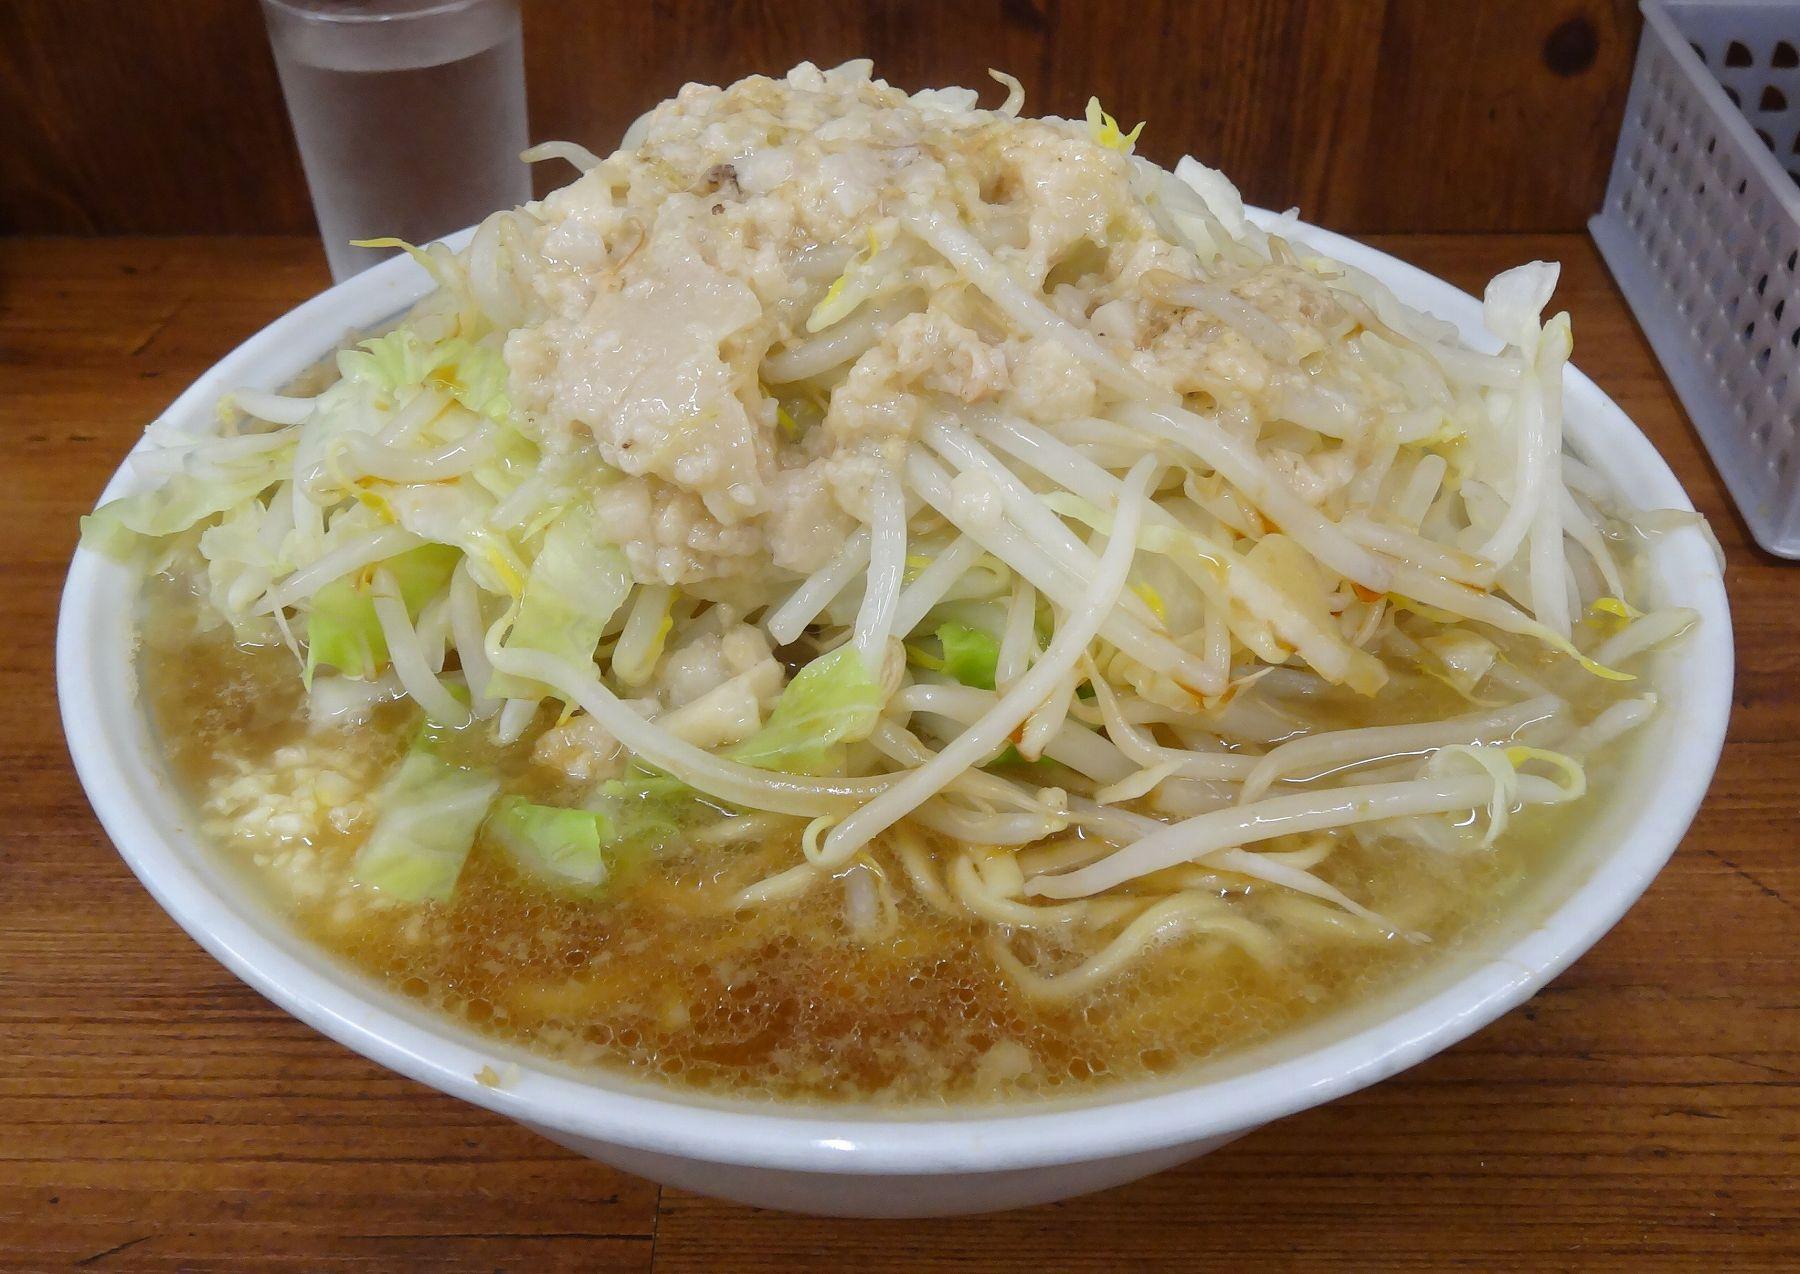 20120928002shinagawa.jpg